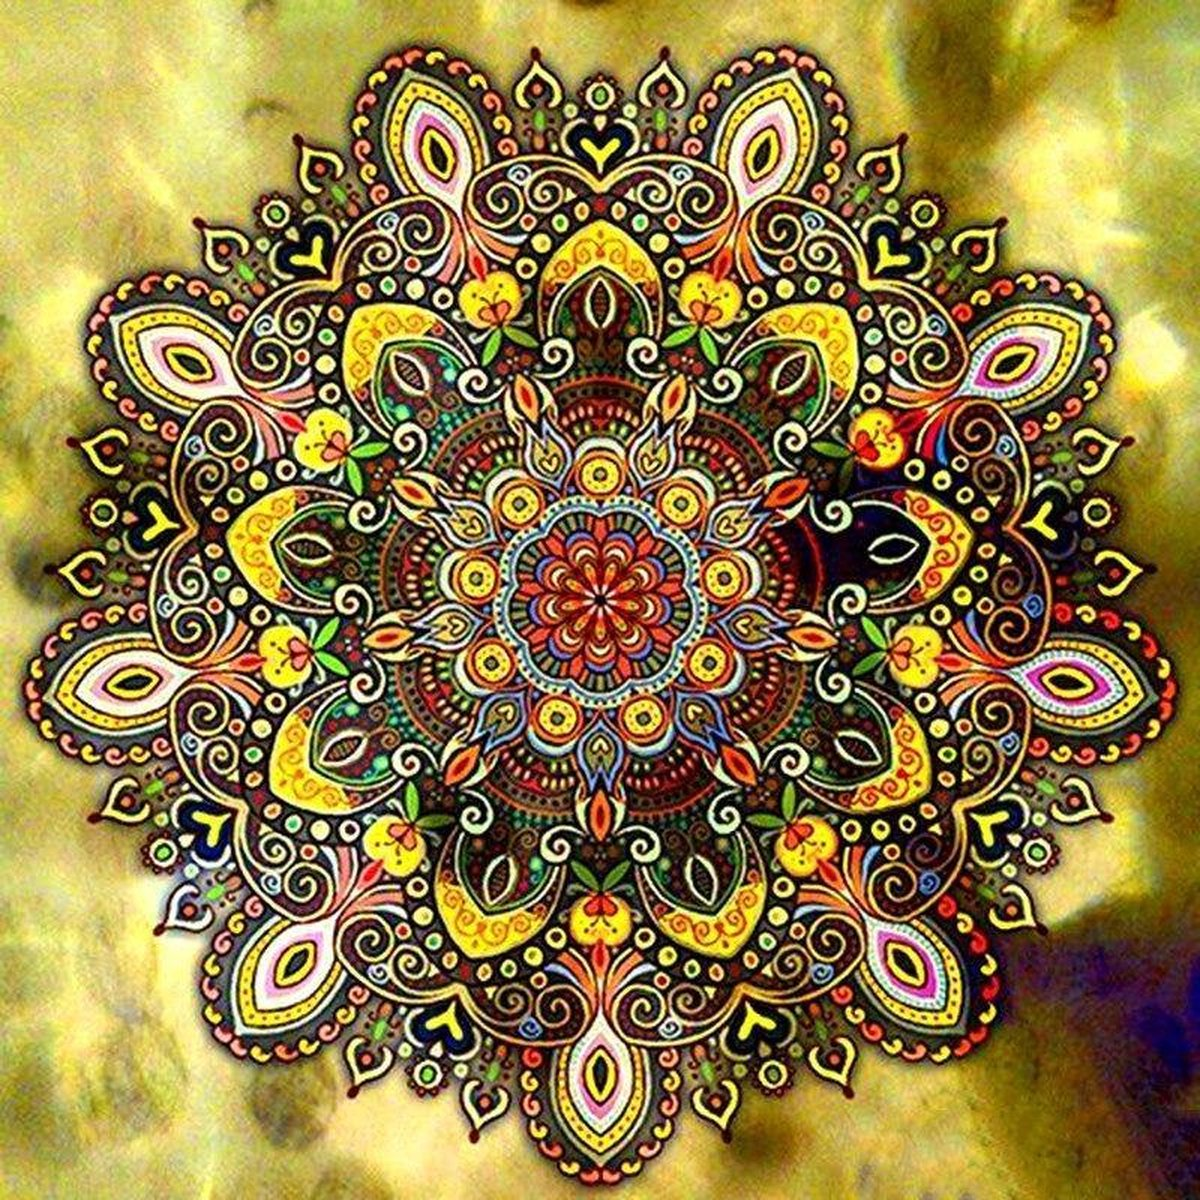 Premium Paintings - Gouden Mandala - Diamond Painting Volwassenen - Pakket Volledig / Pakket Full - 40x40 - Moederdag cadeautje